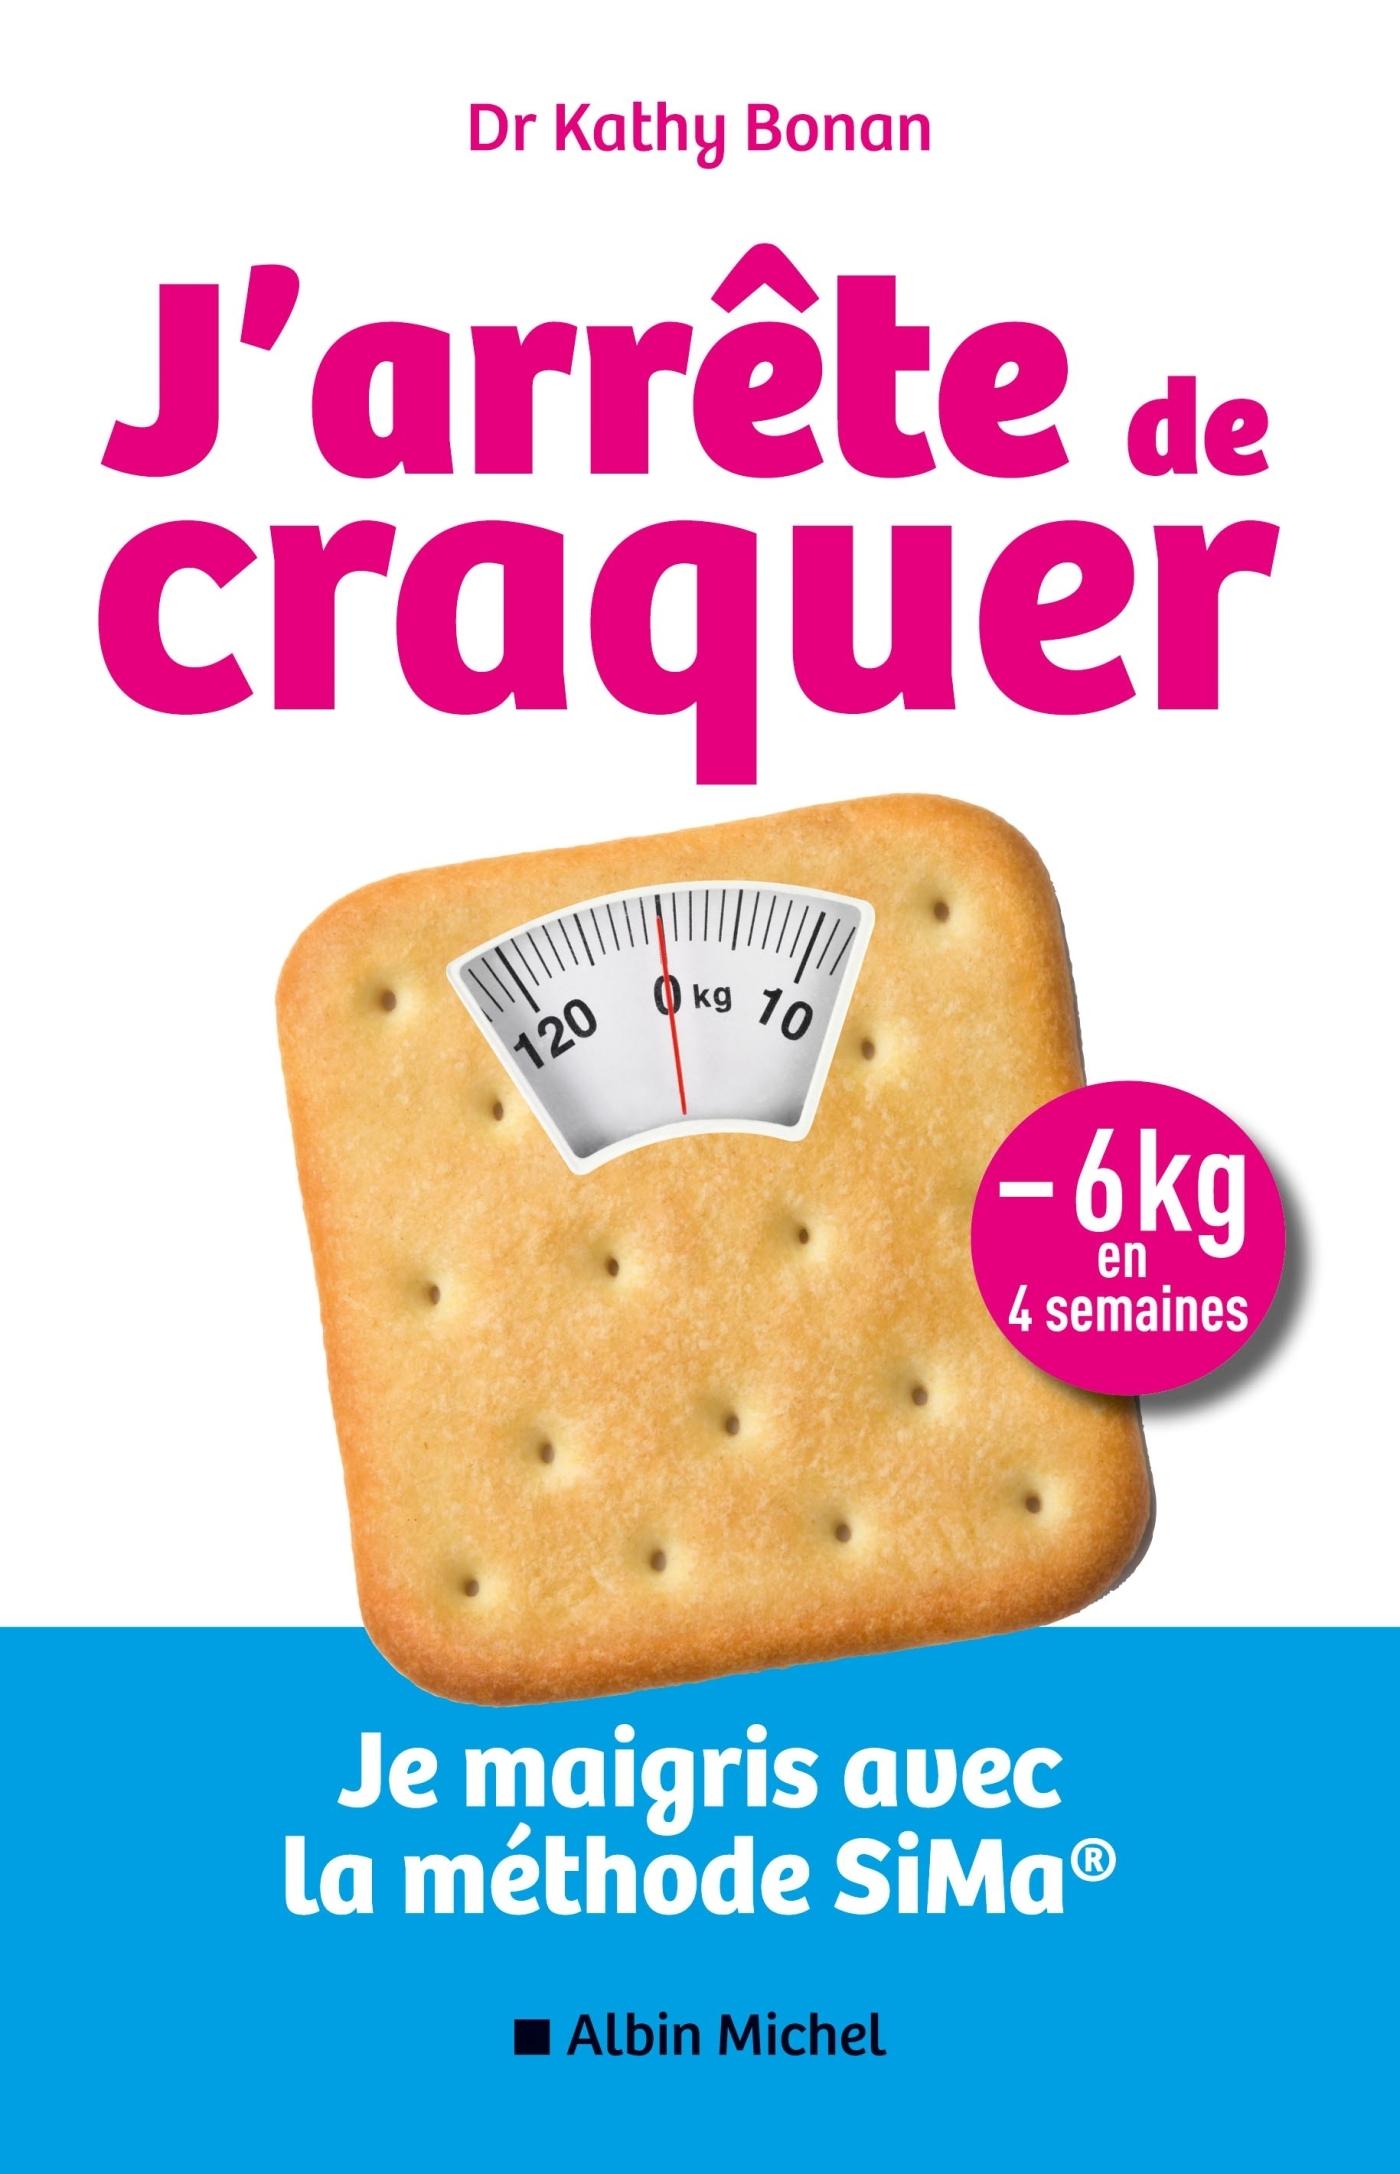 J'ARRETE DE CRAQUER - JE MAIGRIS AVEC LA METHODE SIMA